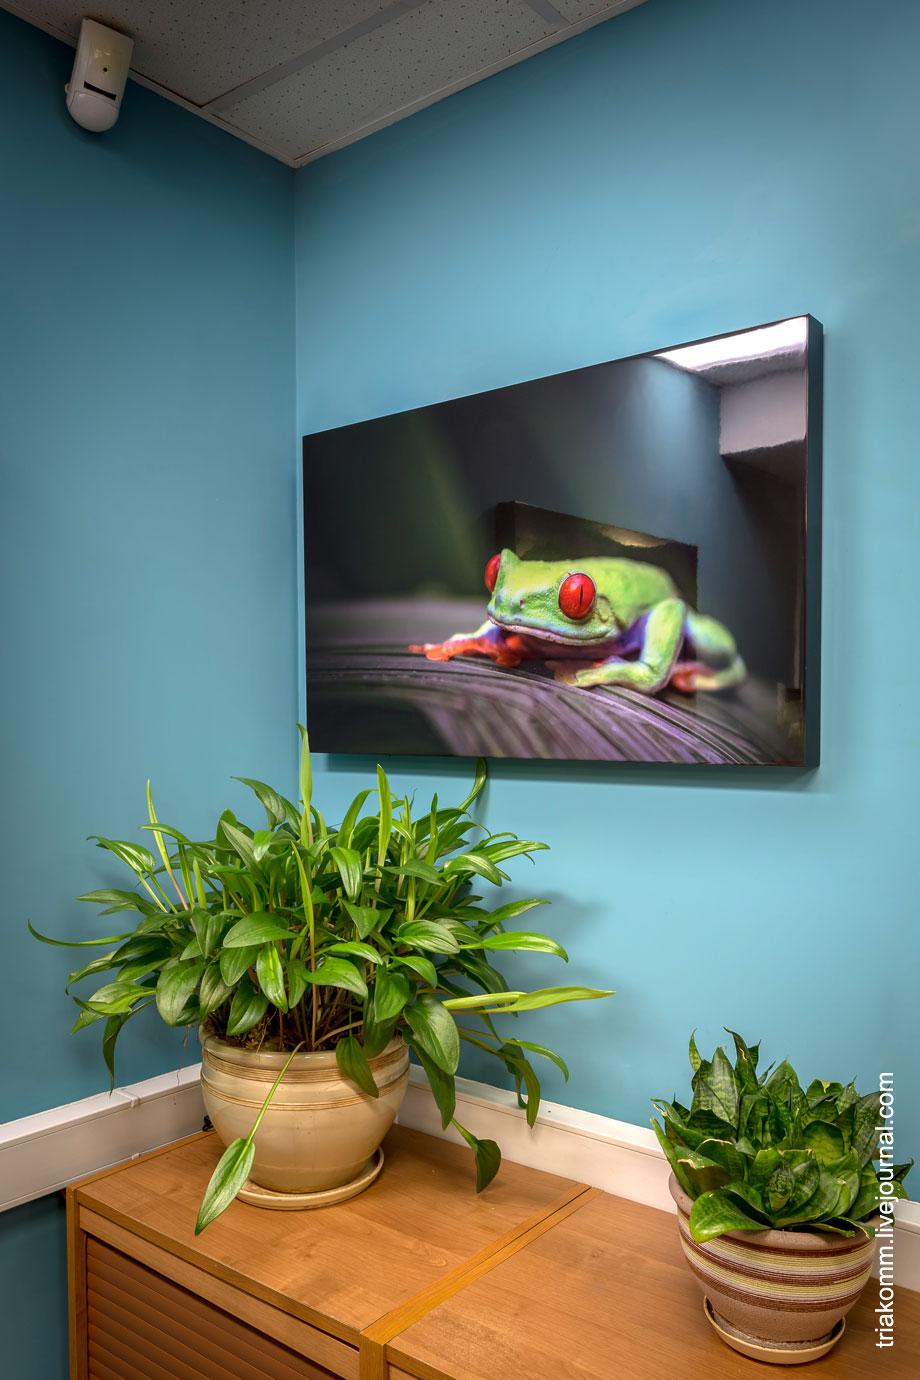 Цветное фото экзотической лягушки на дереве